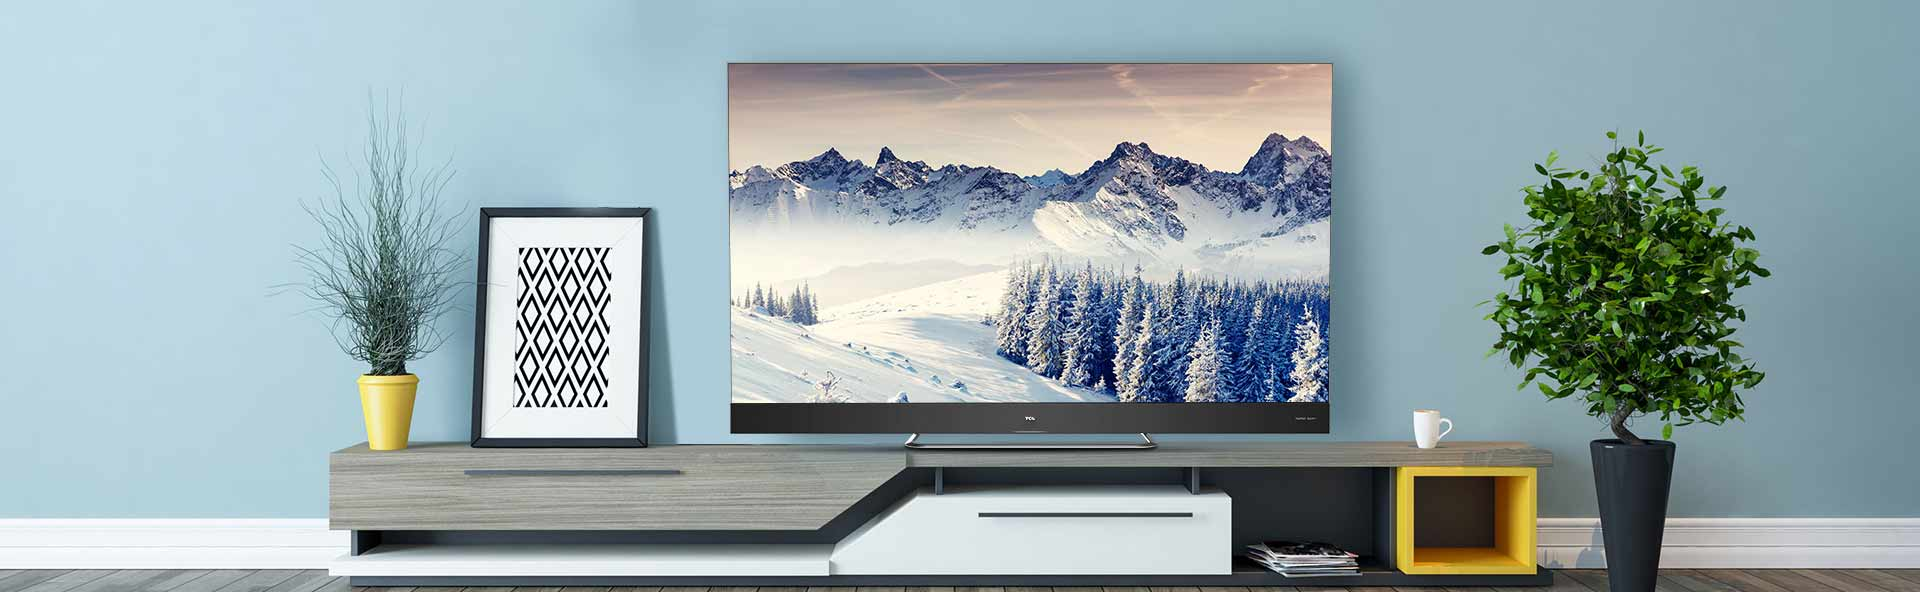 TCL Electronics, nuova gamma TV QLED e smart device mostrata al CES thumbnail